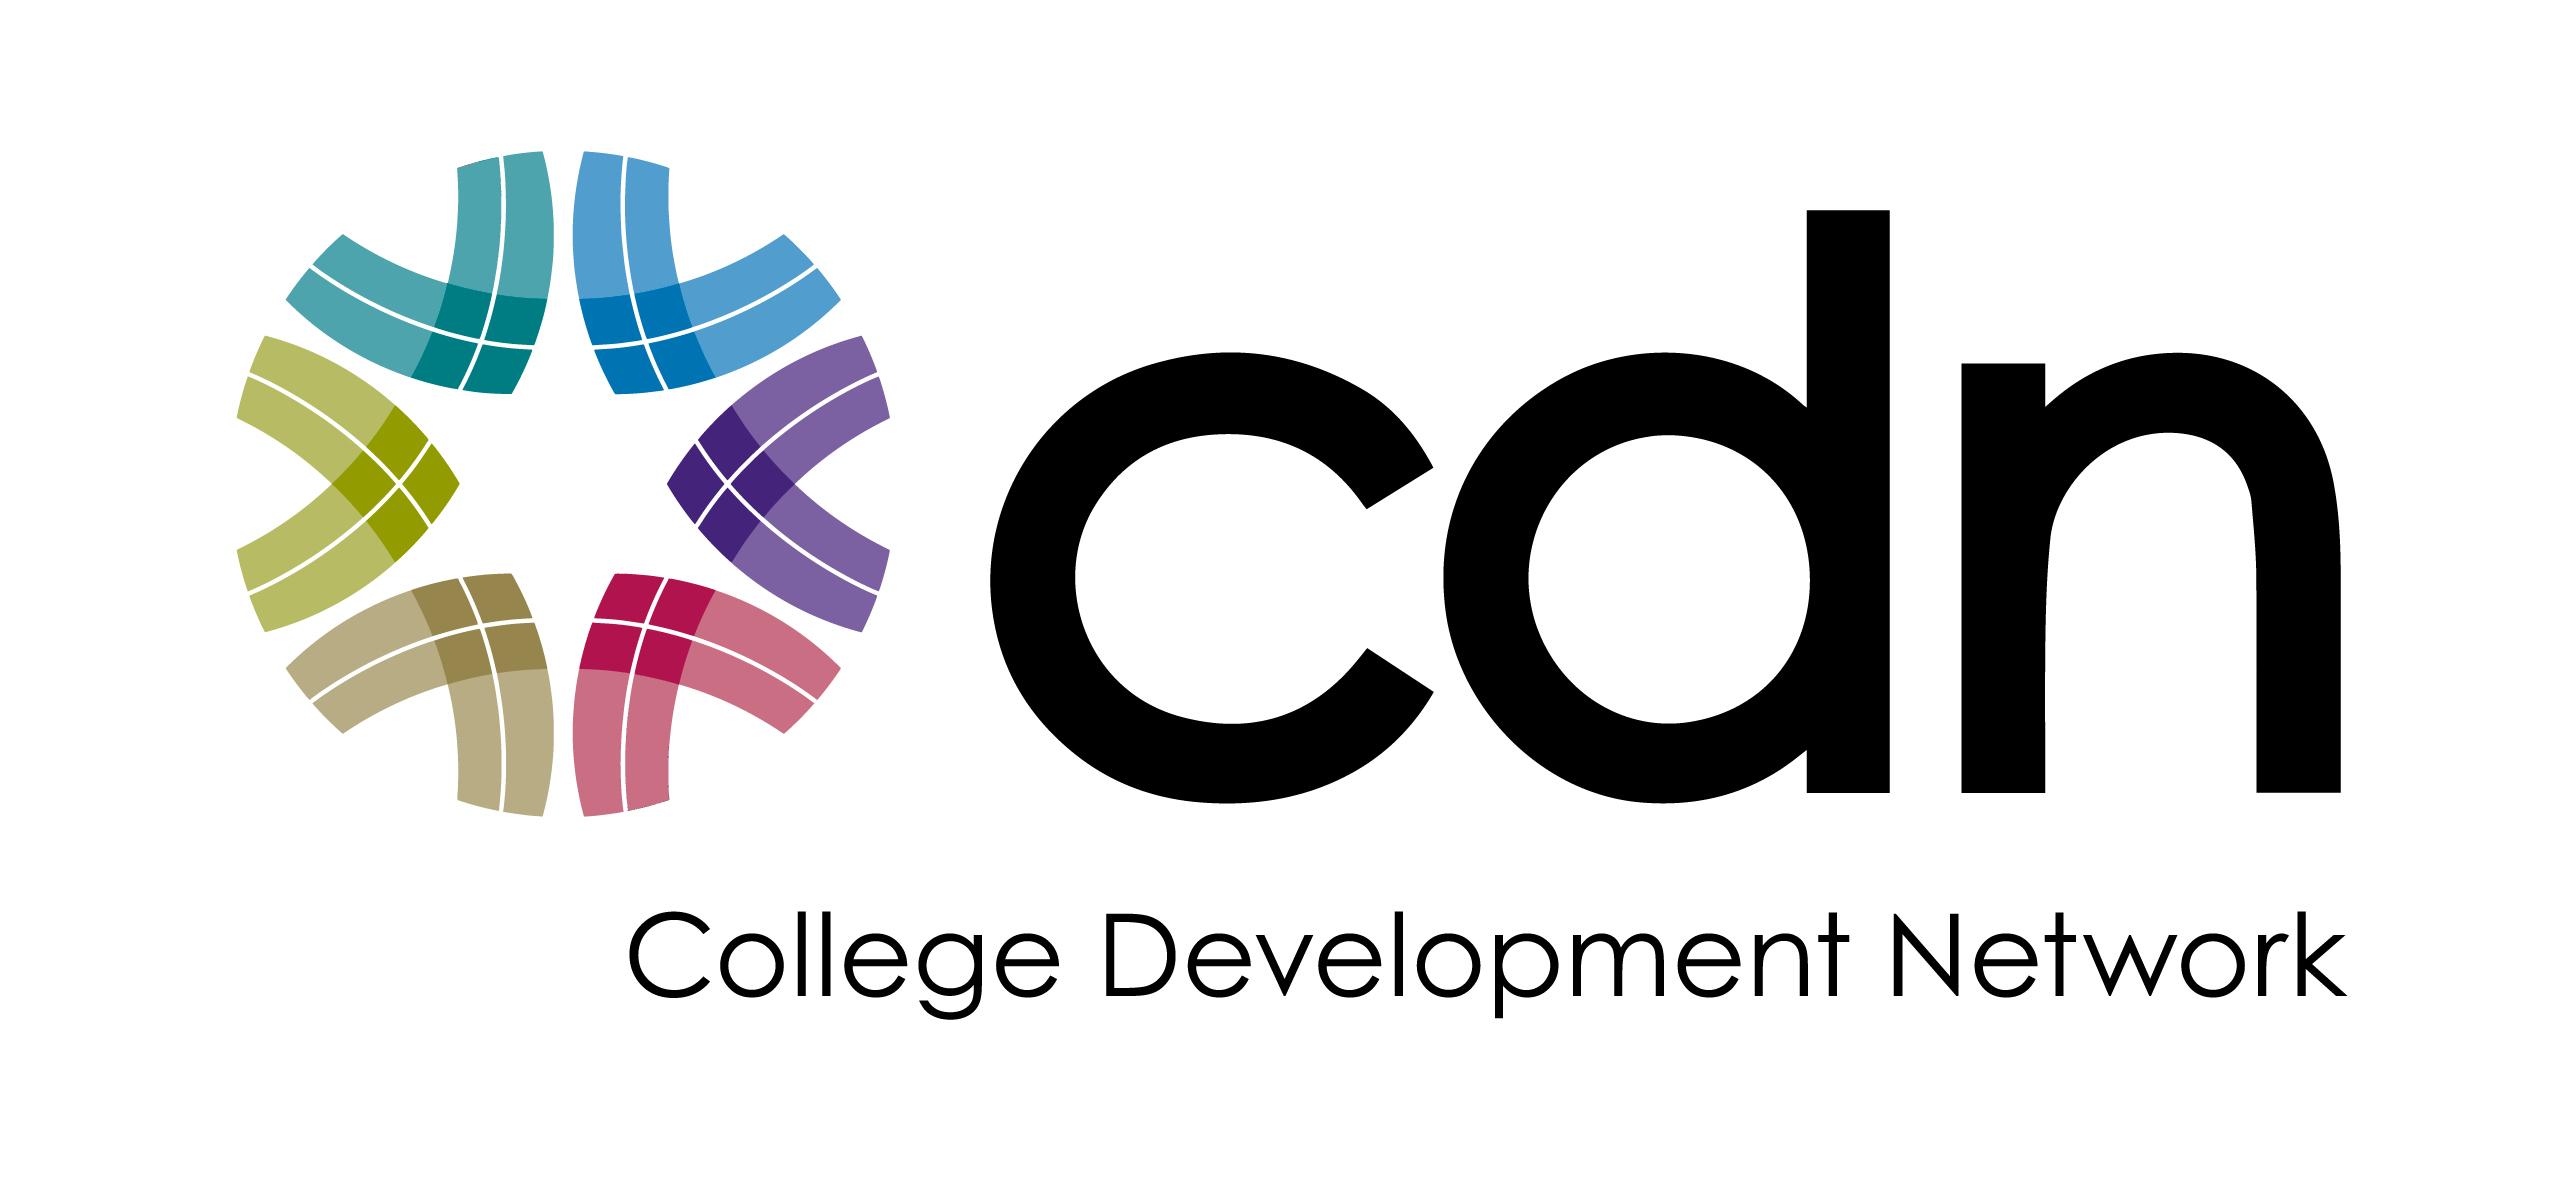 College Development Network